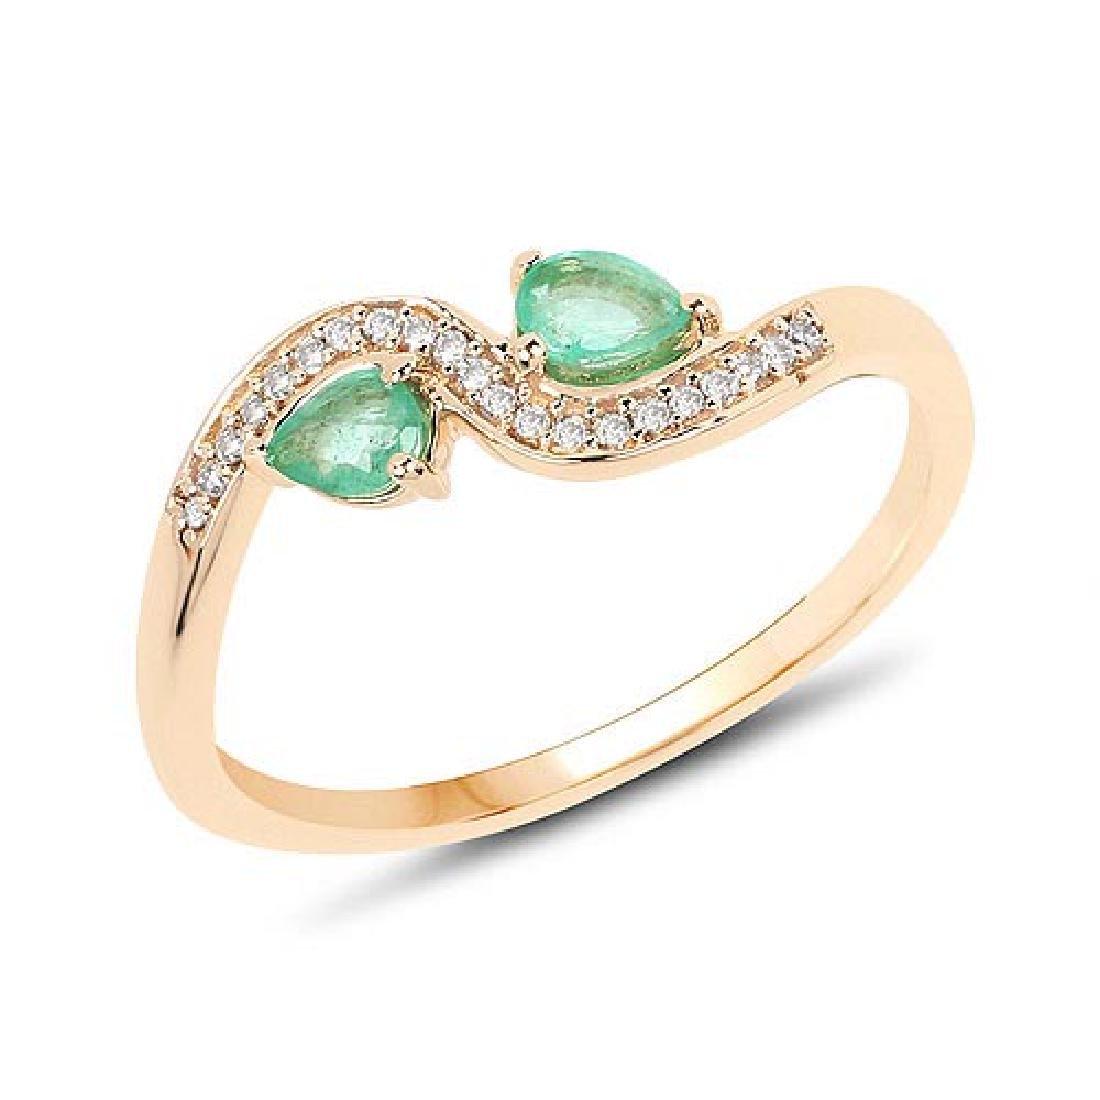 0.34 Carat Genuine Zambian Emerald and White Diamond 14